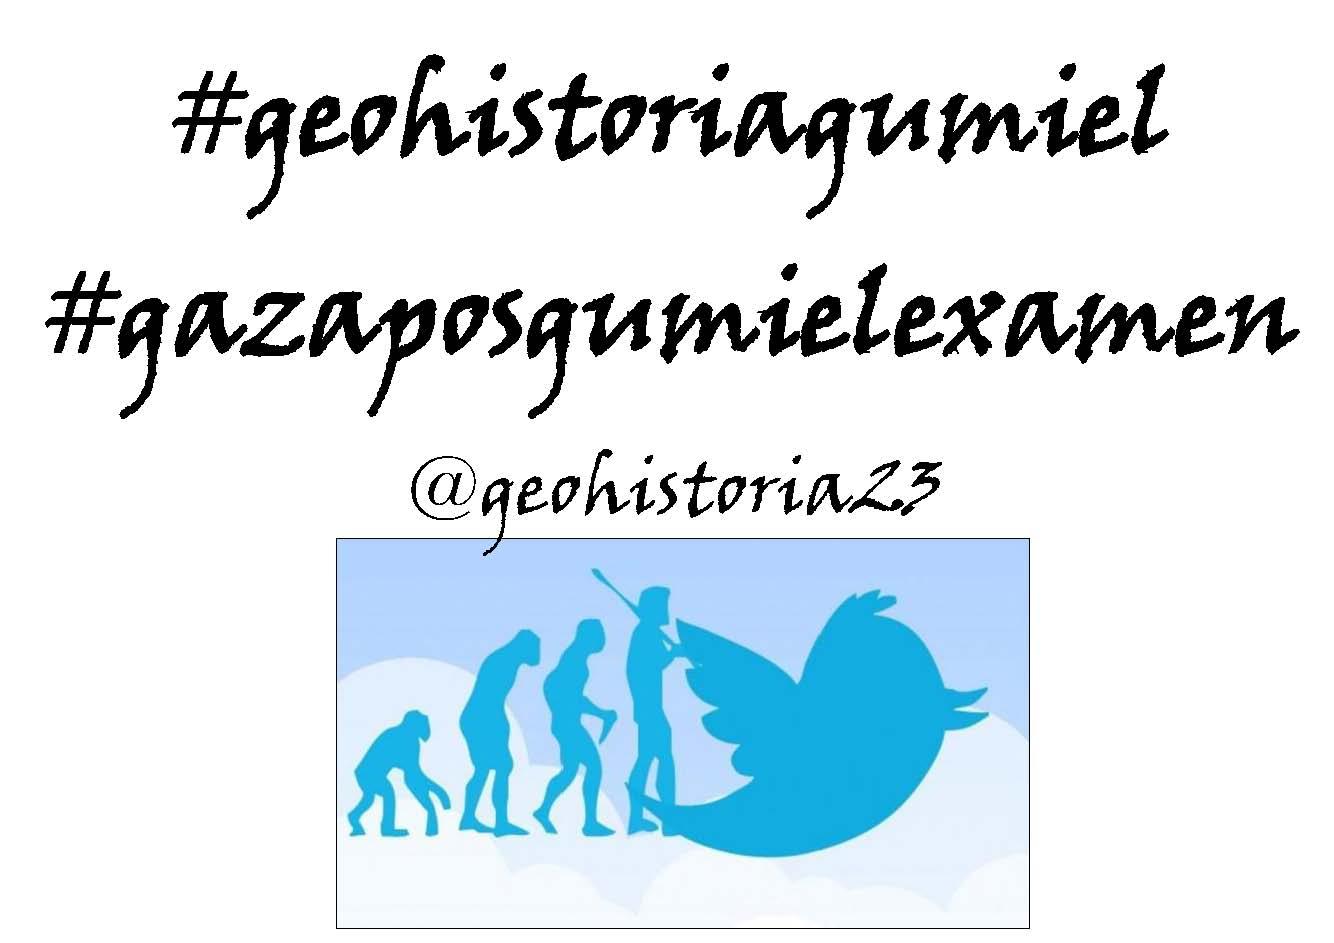 #geohistoriagumiel